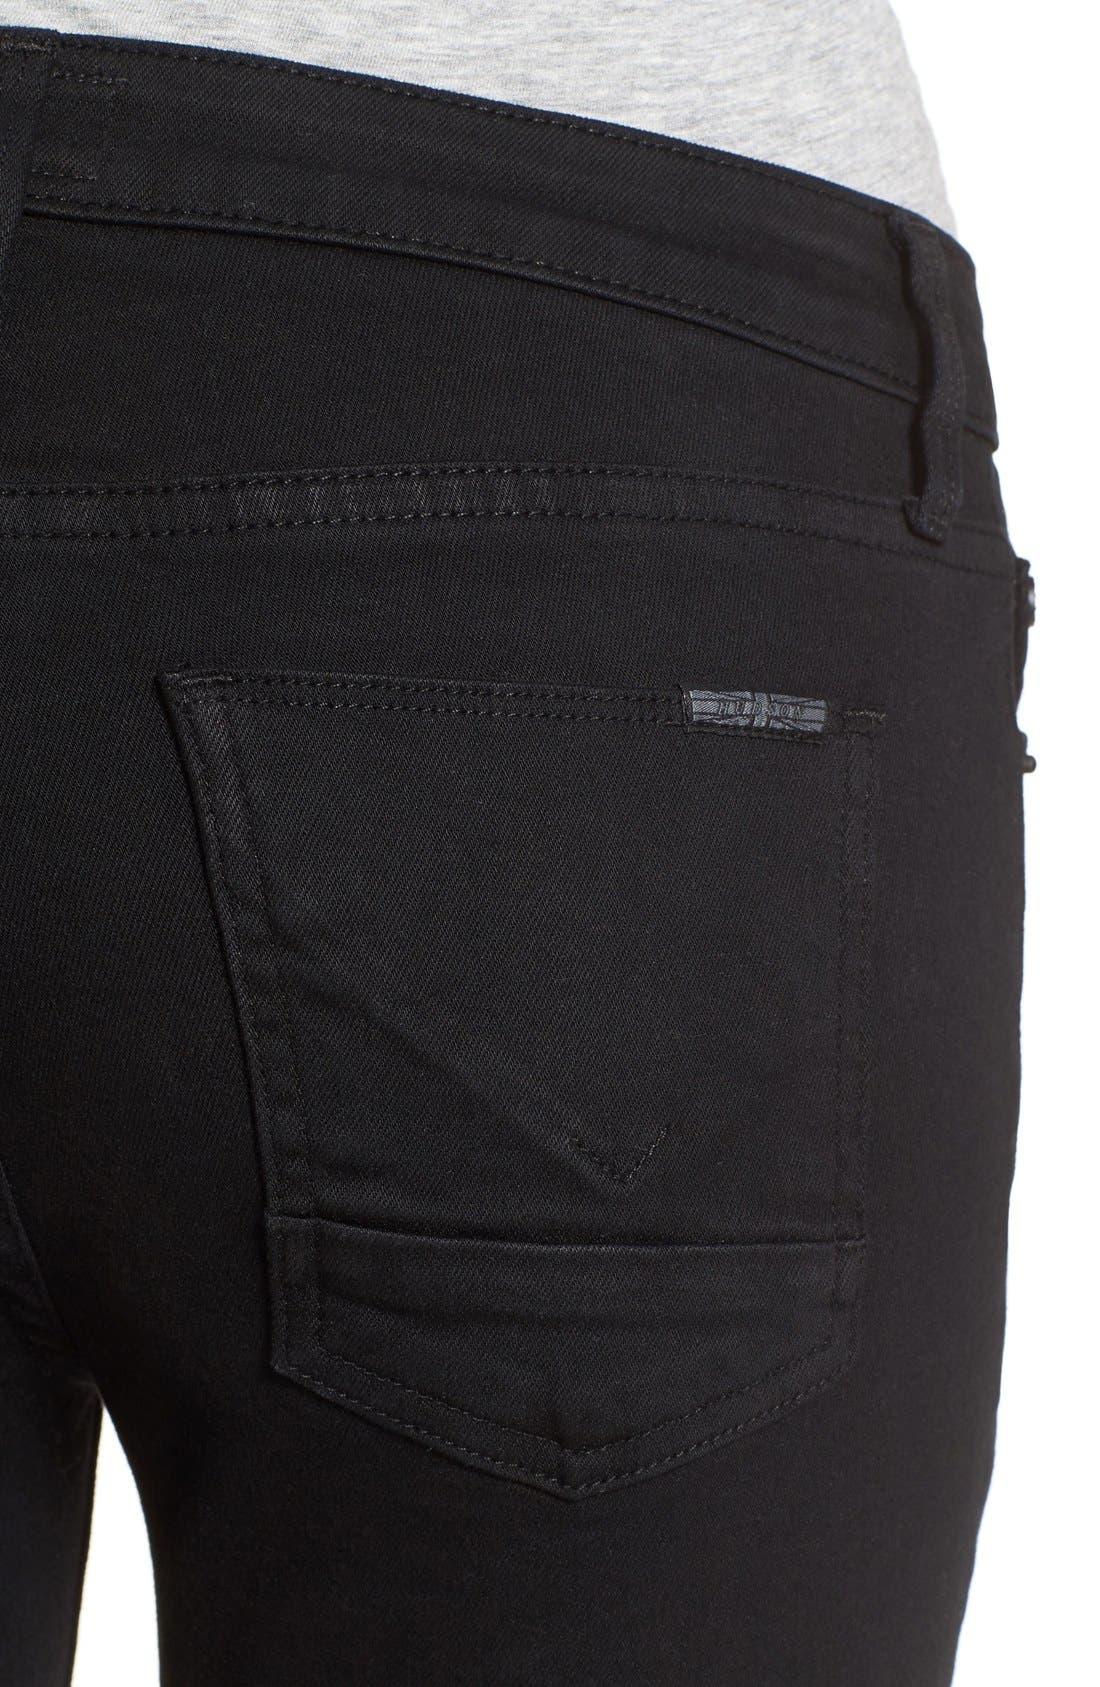 Alternate Image 4  - Hudson Jeans 'Mia' Raw Hem Crop Flare Jeans